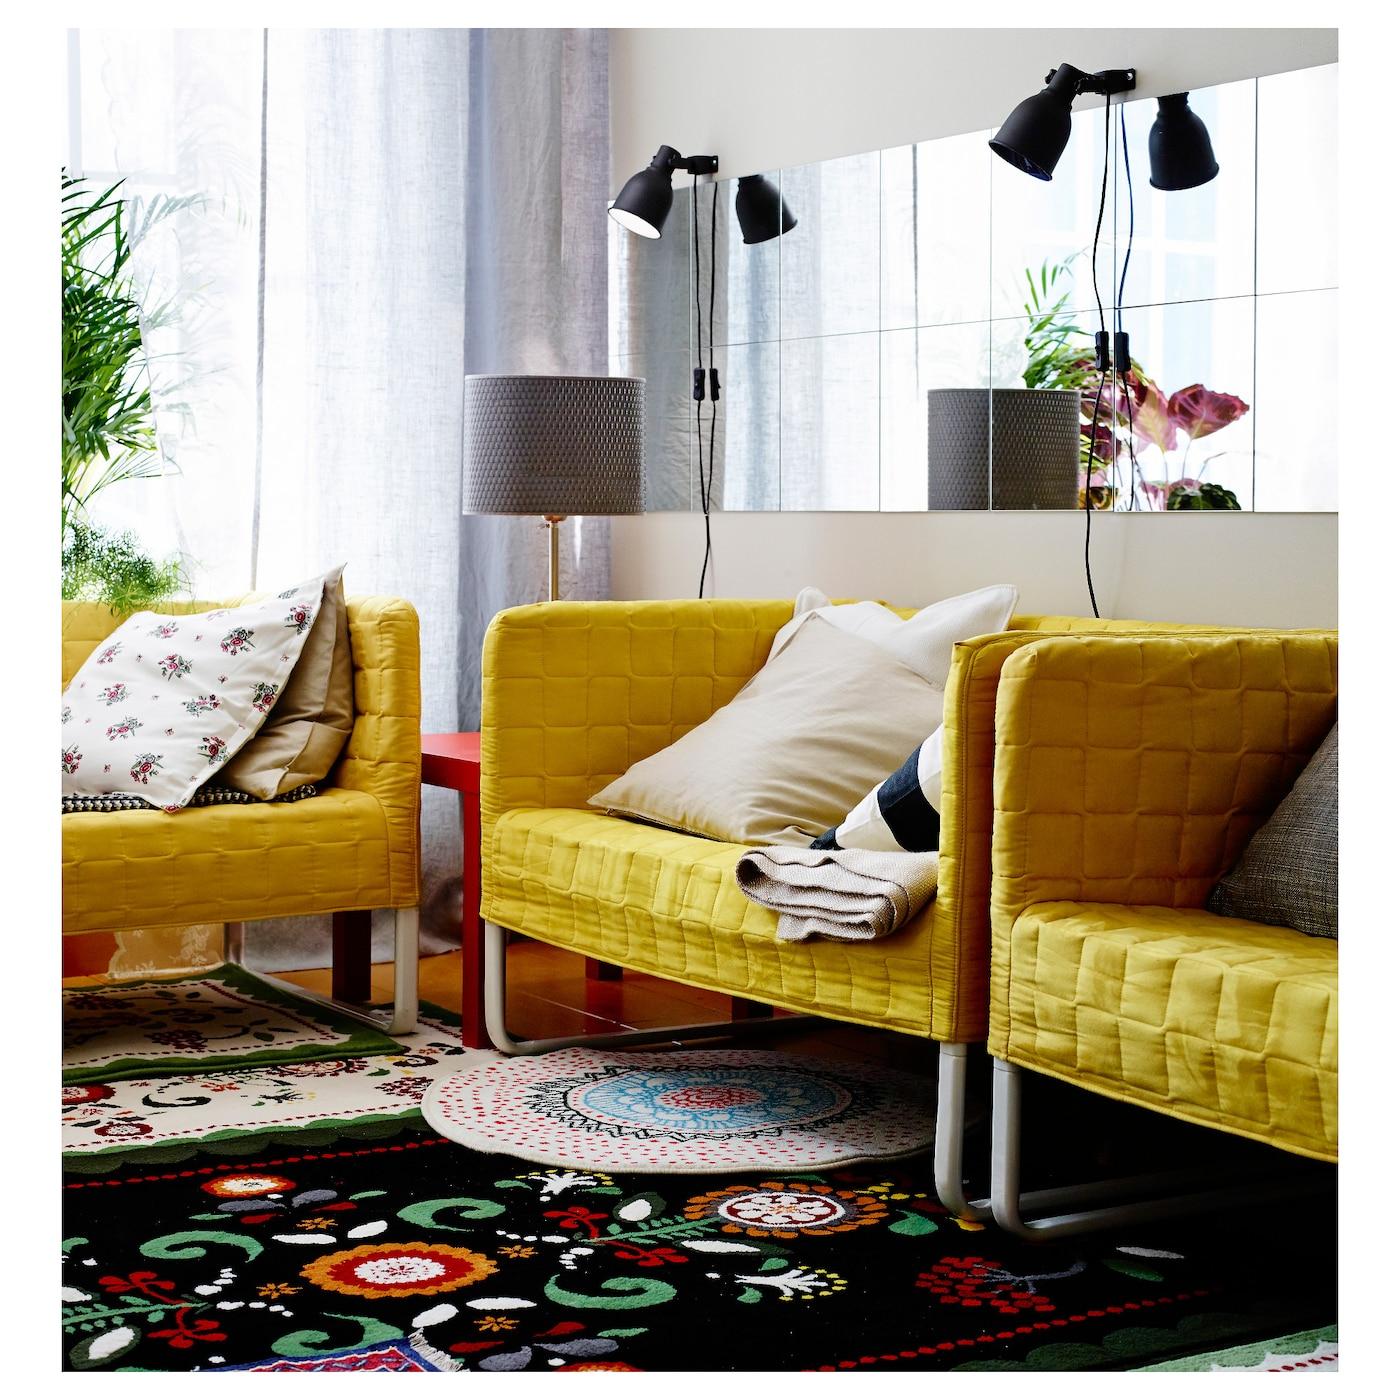 12x12 Bedroom Ideas Design Corral